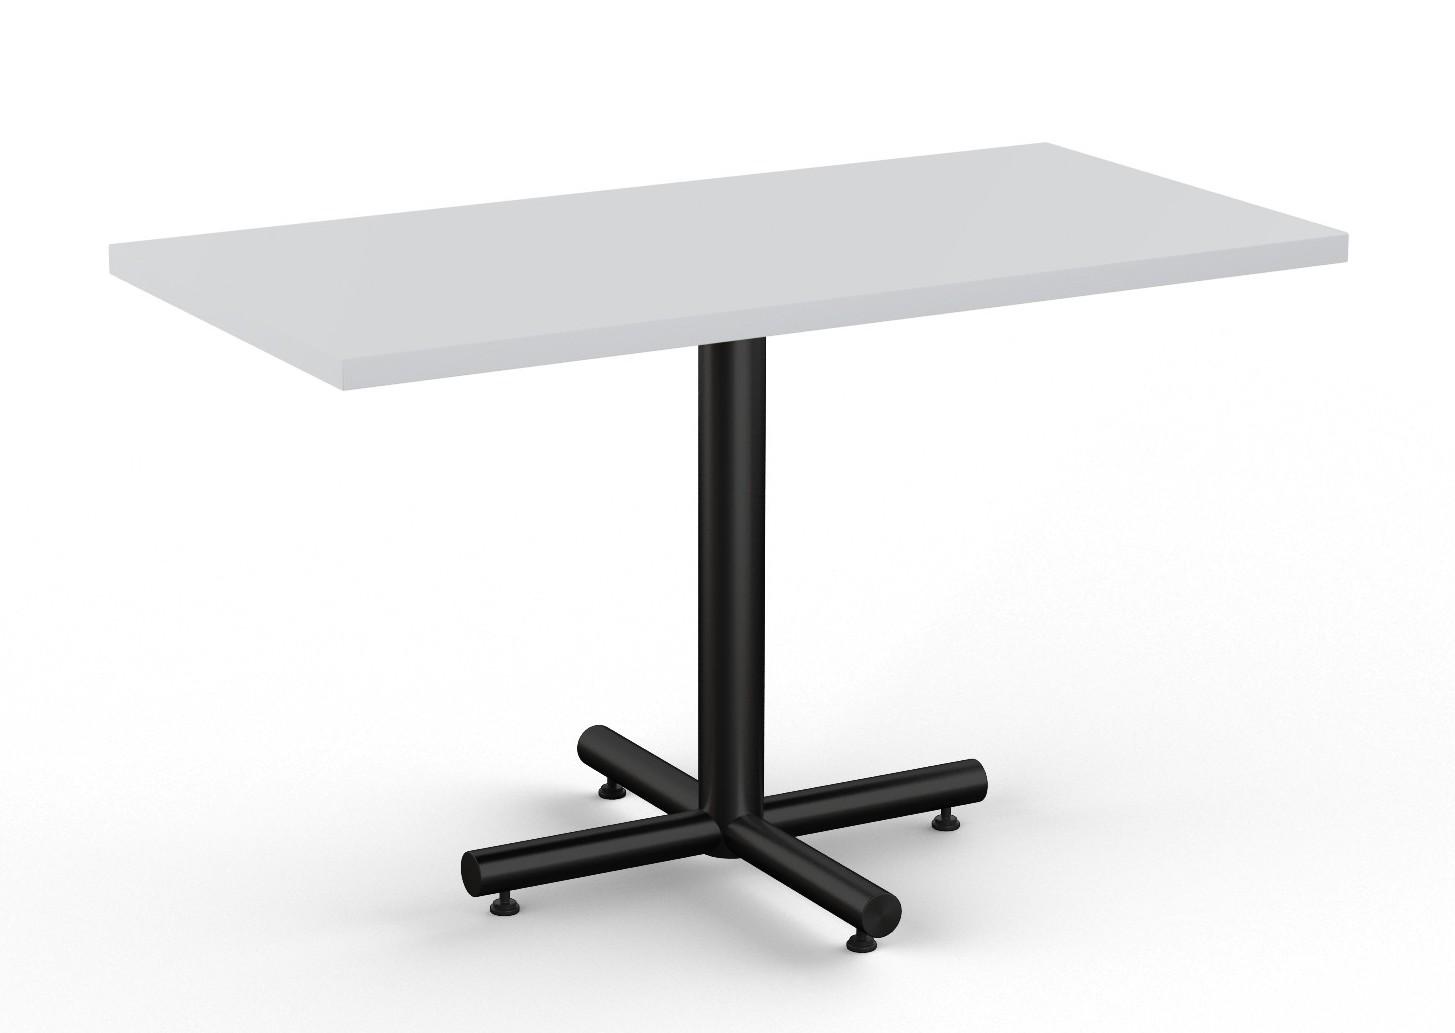 light grey finished classix rectangular cafe table